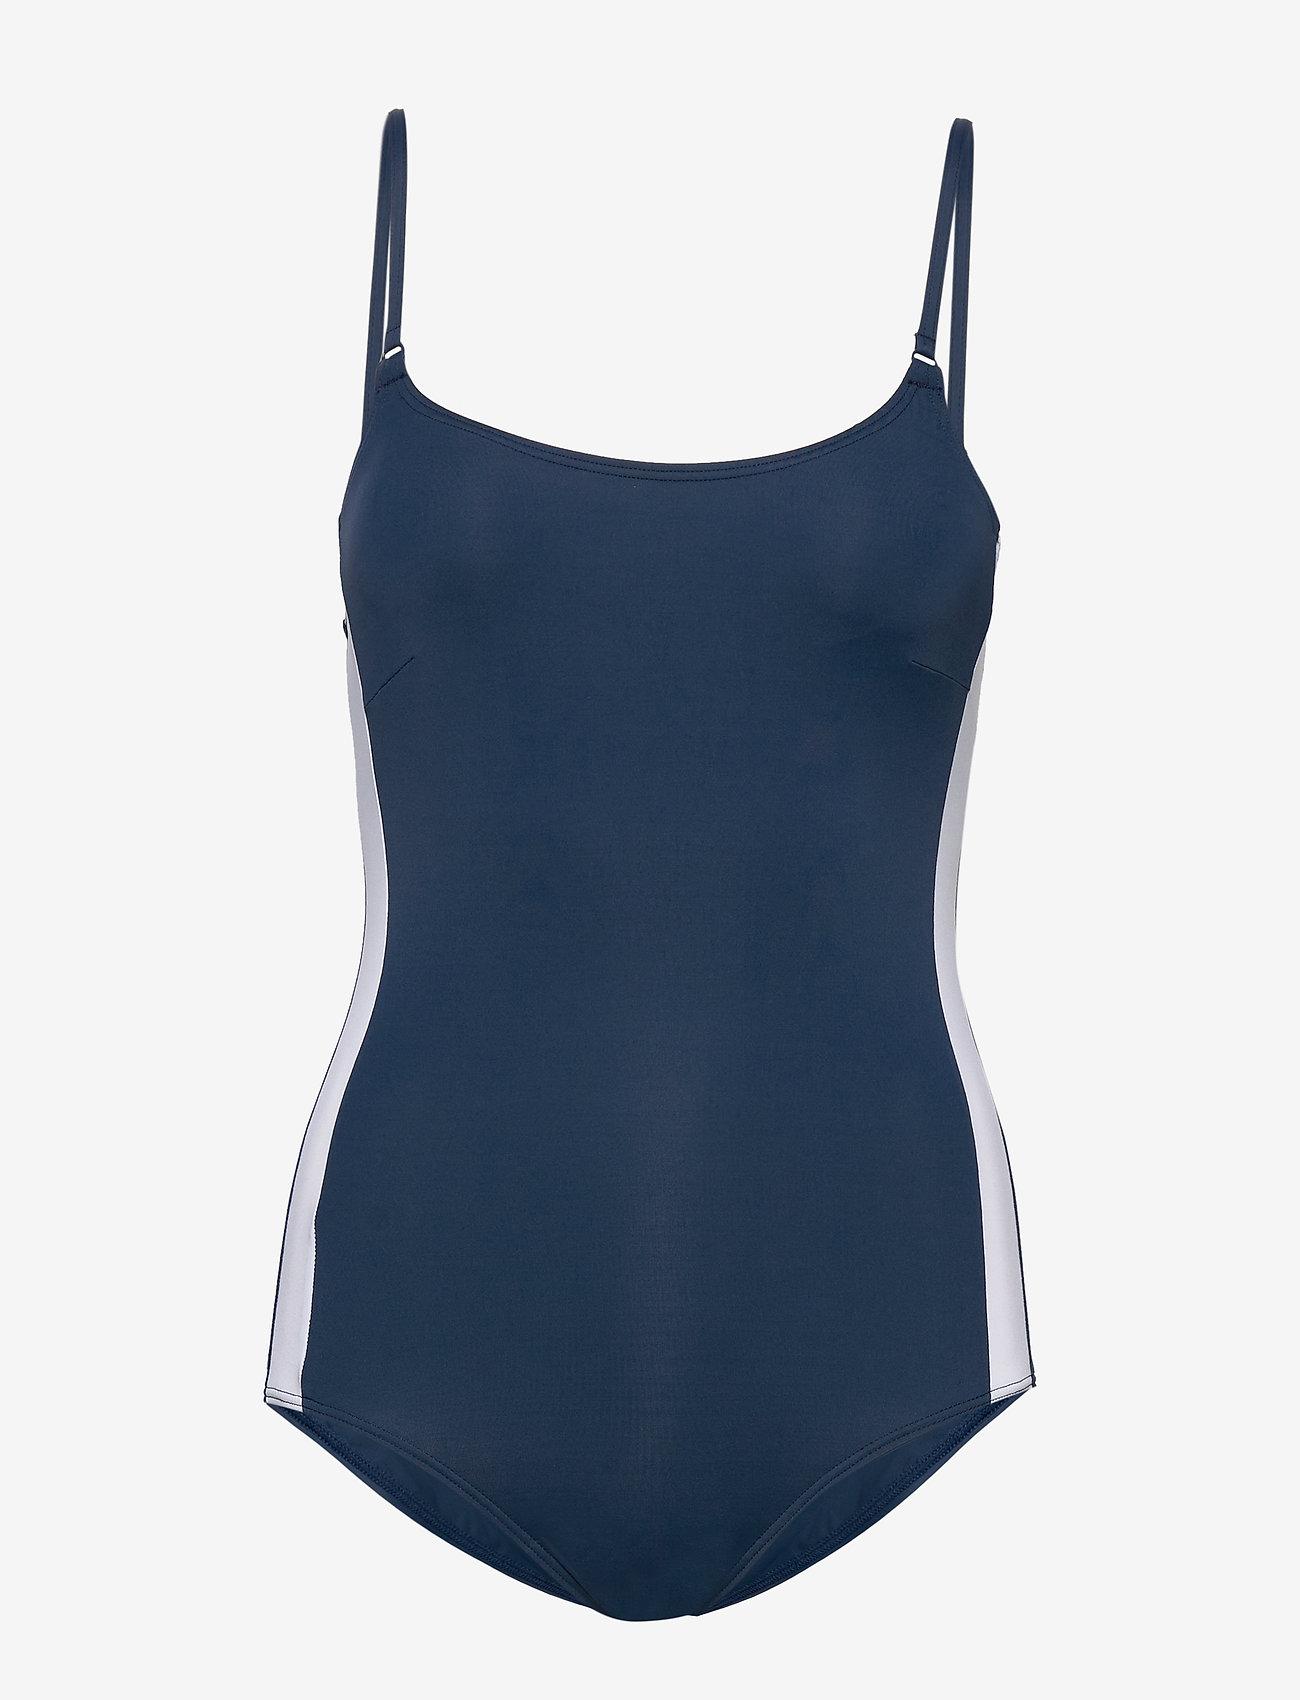 Esprit Bodywear Women - Swimsuits - badedrakter - dark blue - 0